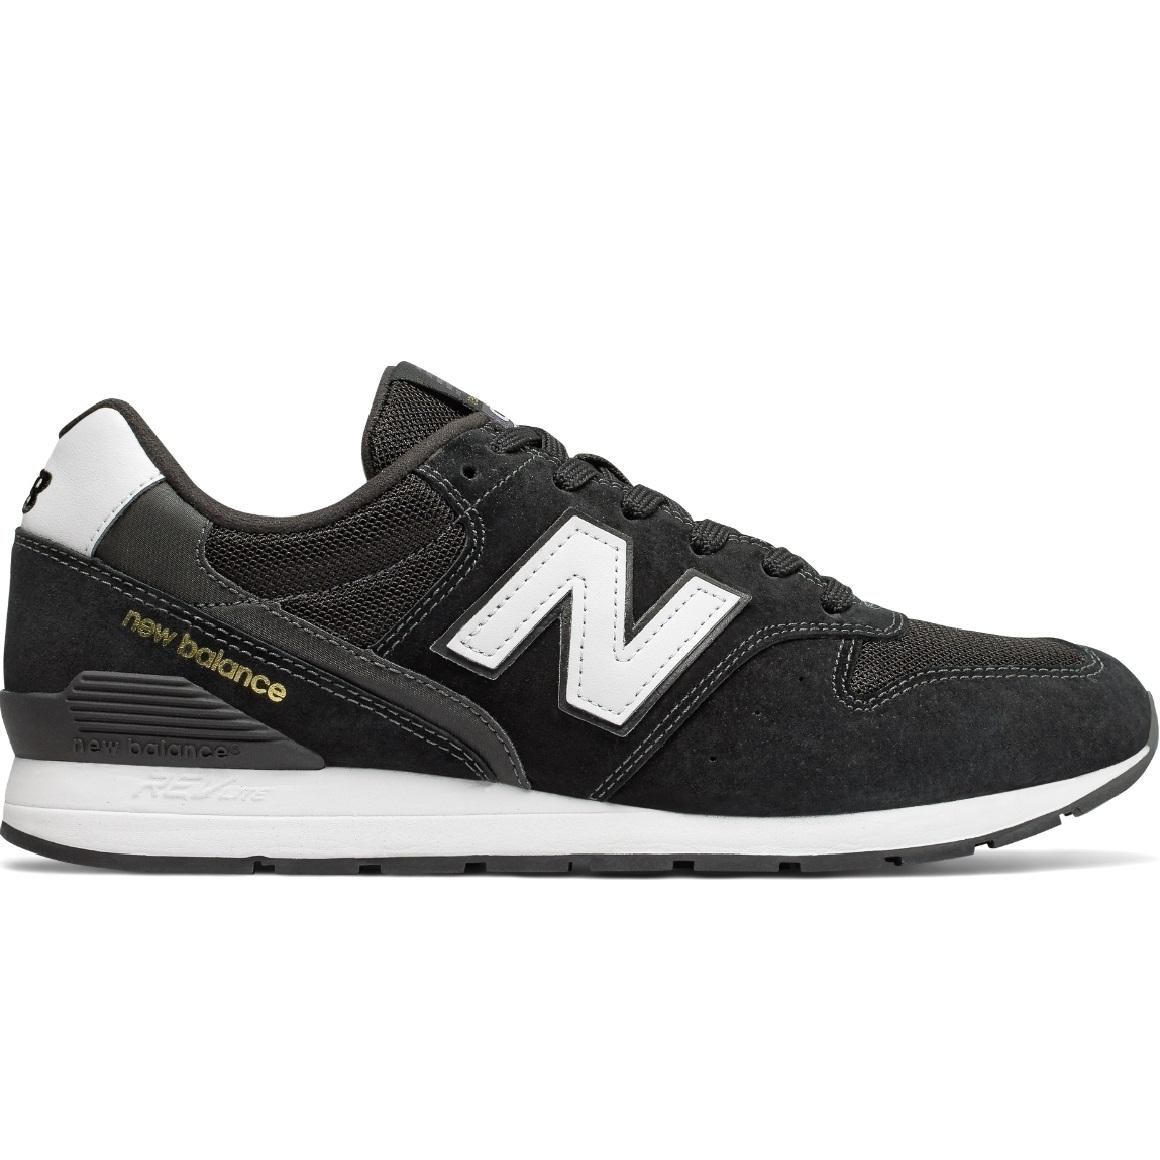 New Balance MRL 996 Sneaker